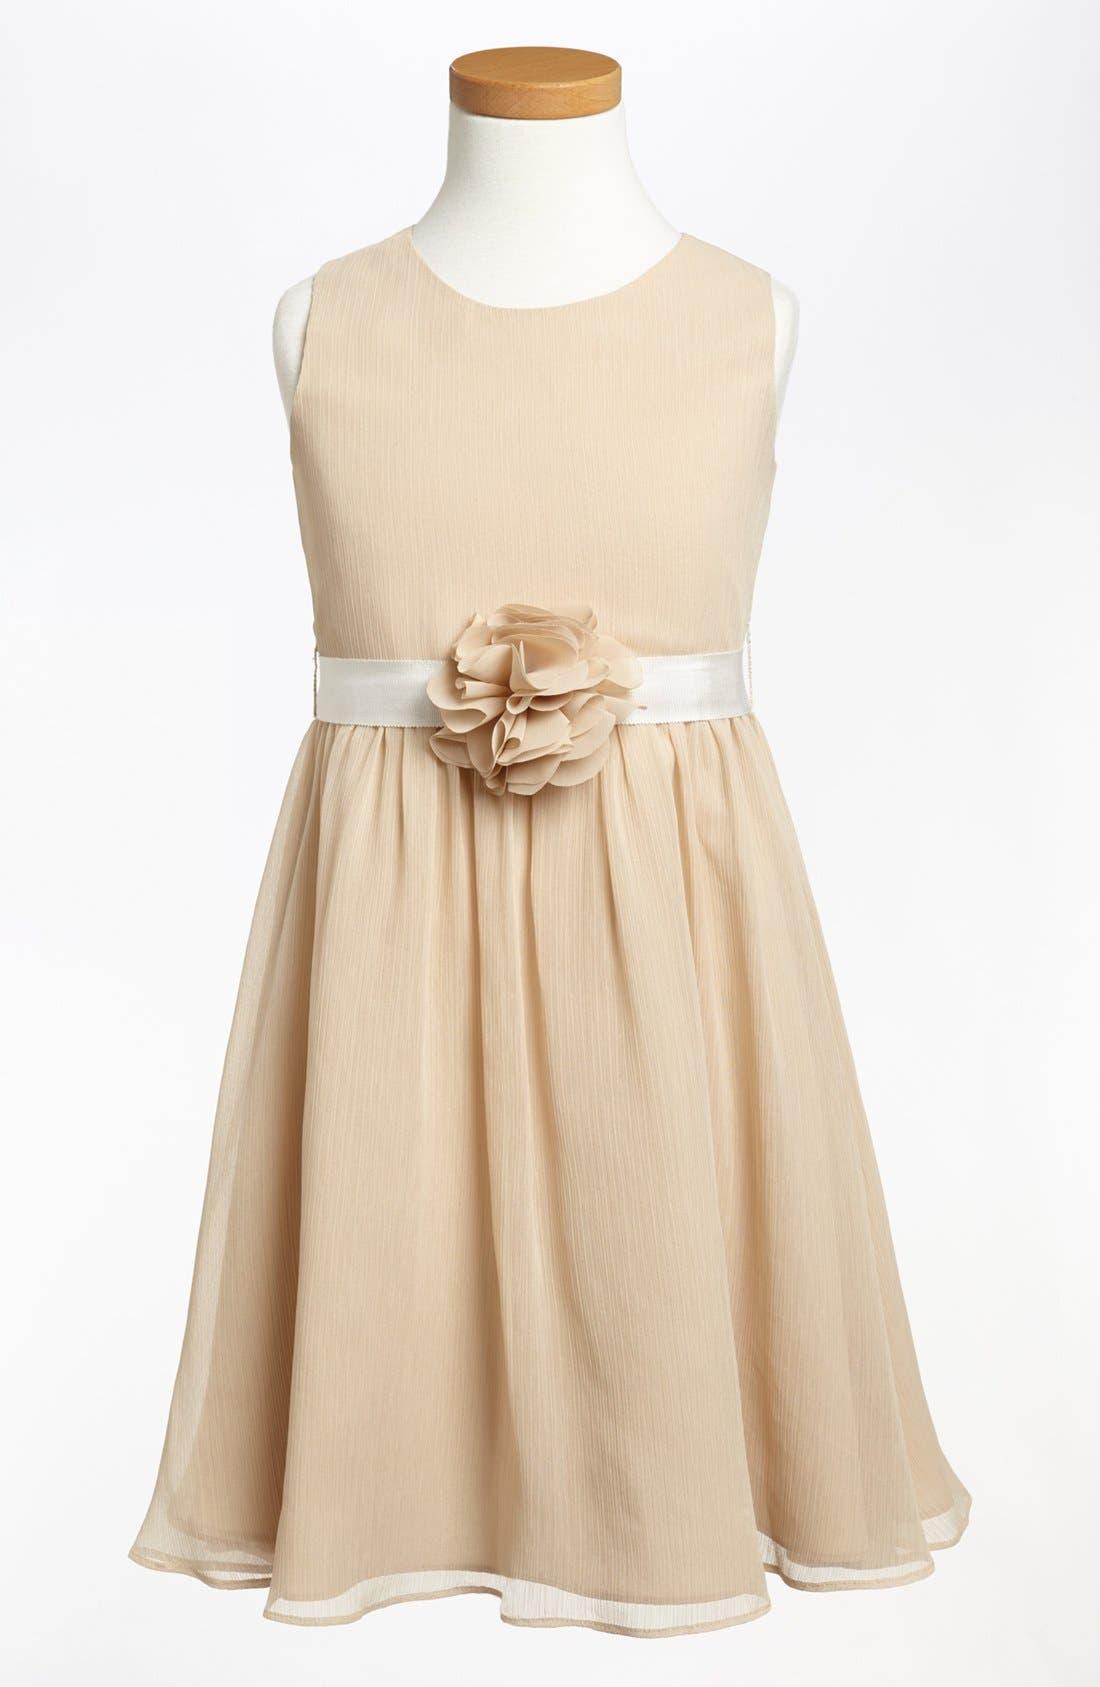 Us Angels Sleeveless Chiffon Dress (Little Girls & Big Girls)